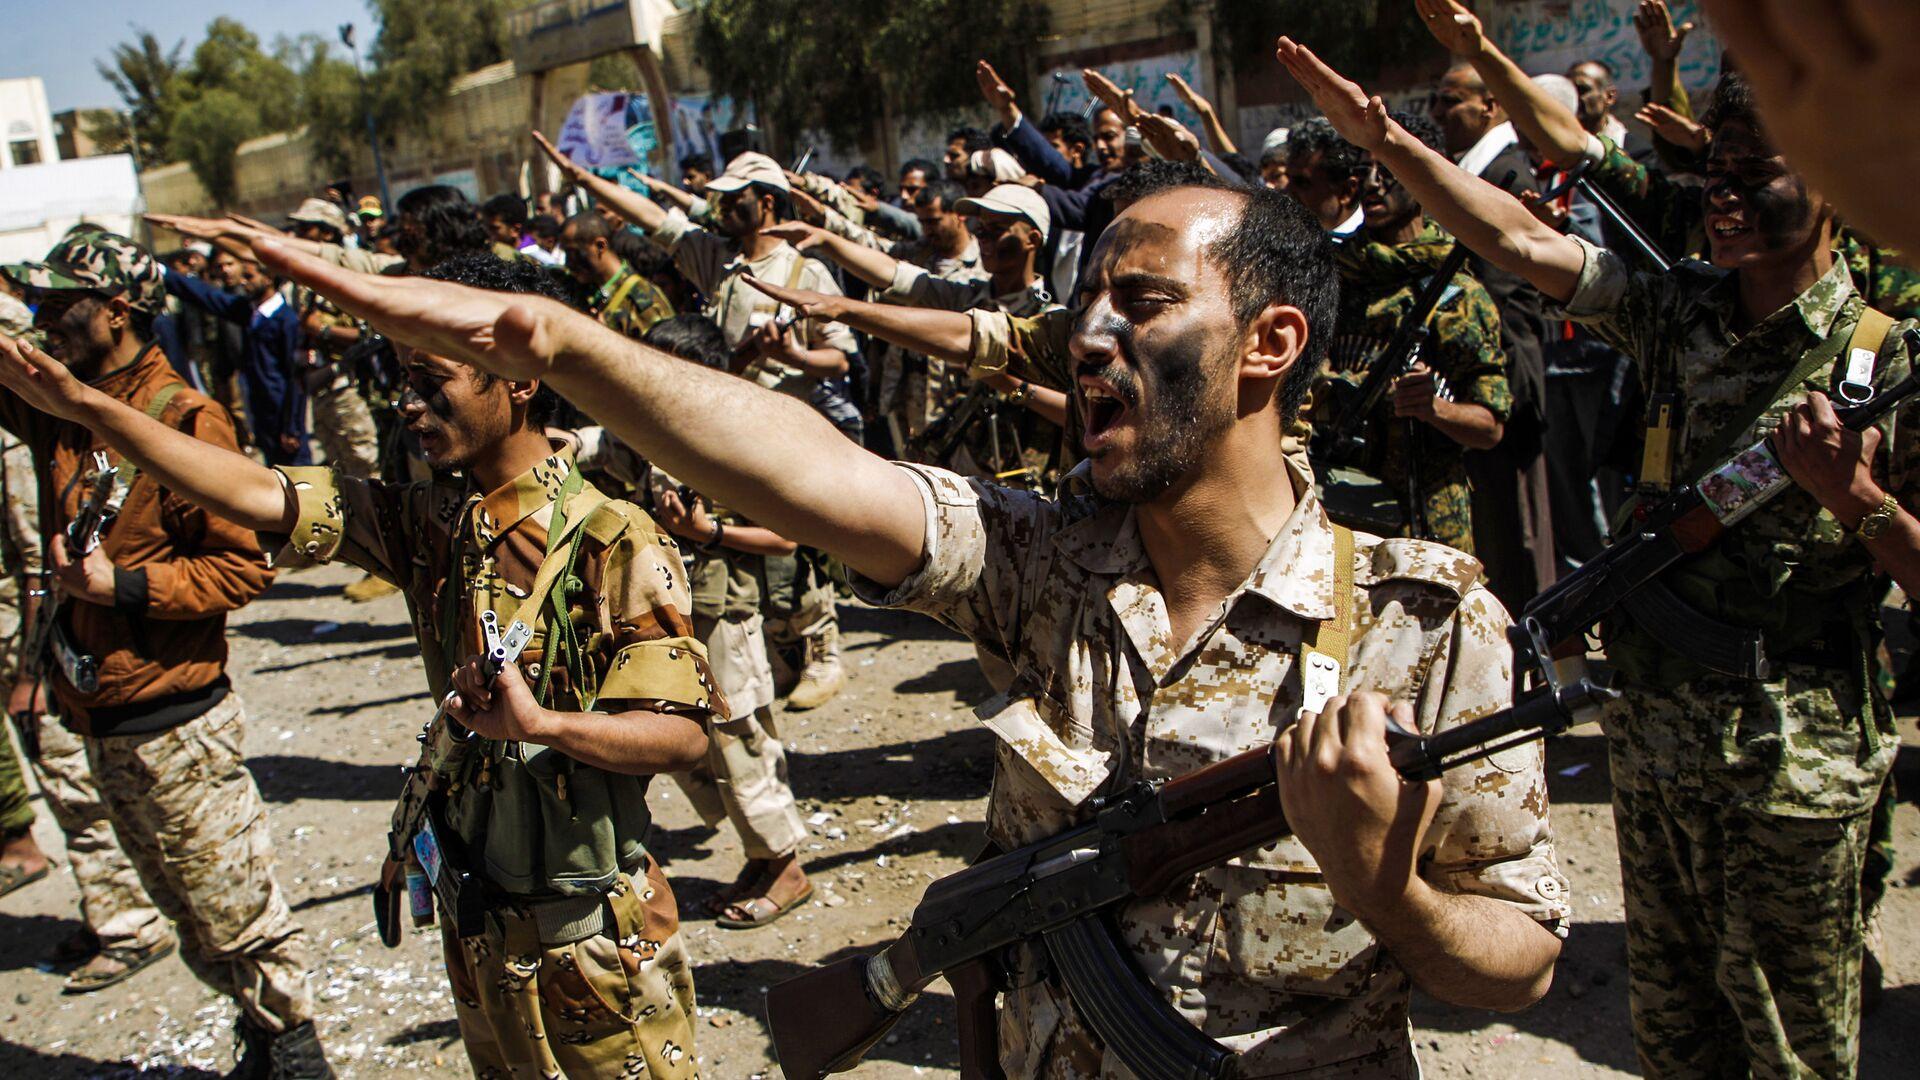 Truppe degli Huthi in Yemen - Sputnik Italia, 1920, 01.04.2021